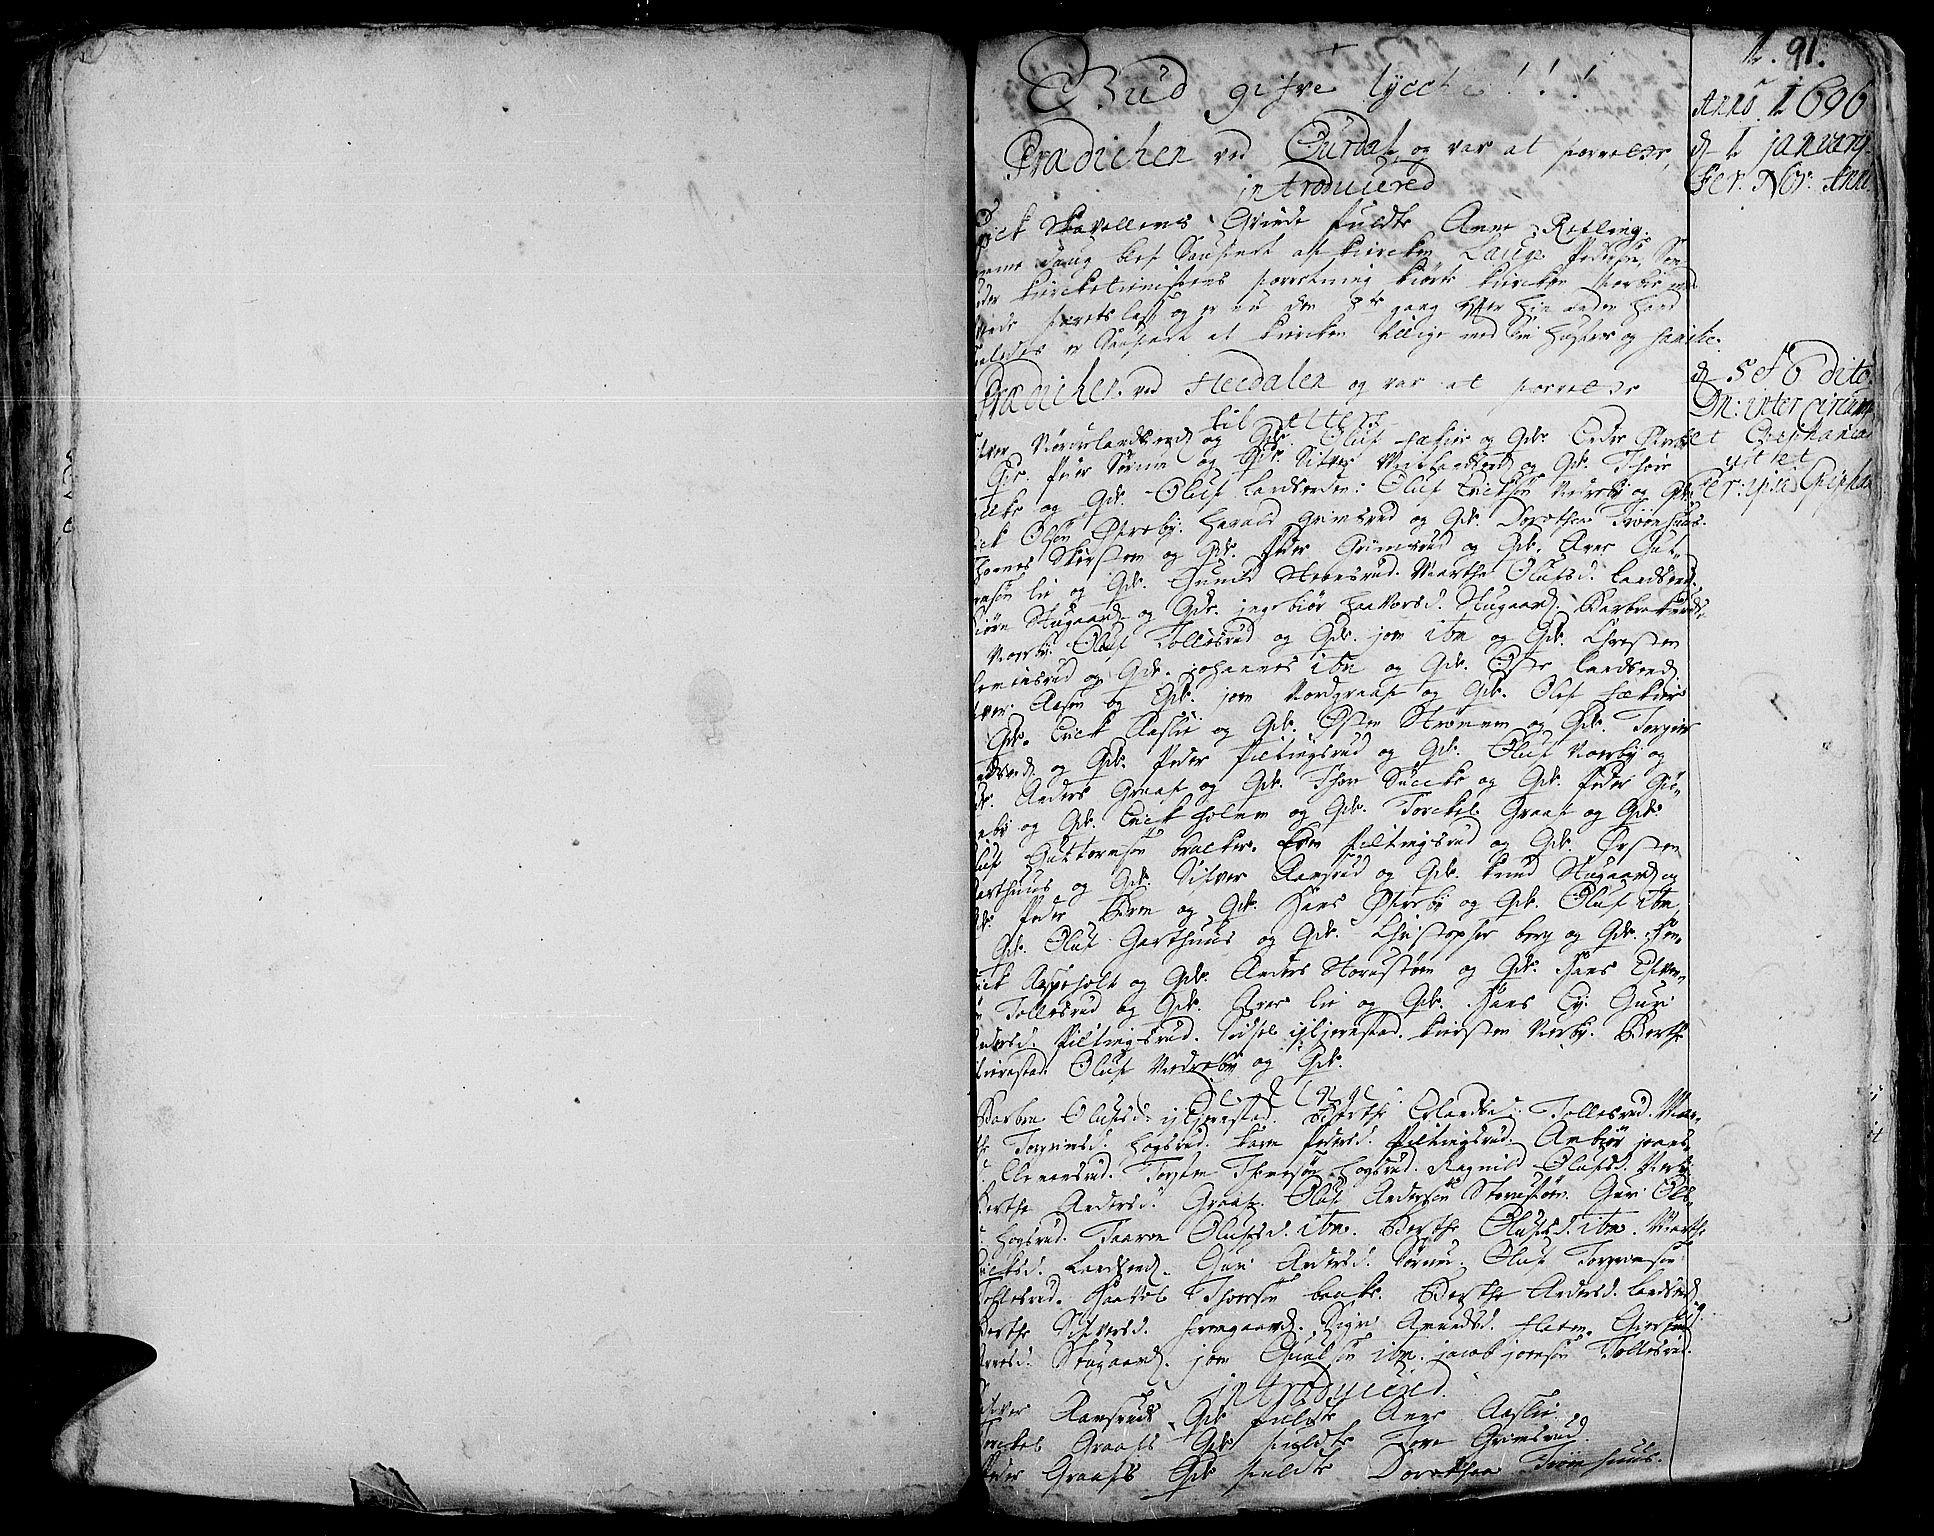 SAH, Aurdal prestekontor, Ministerialbok nr. 1-3, 1692-1730, s. 91